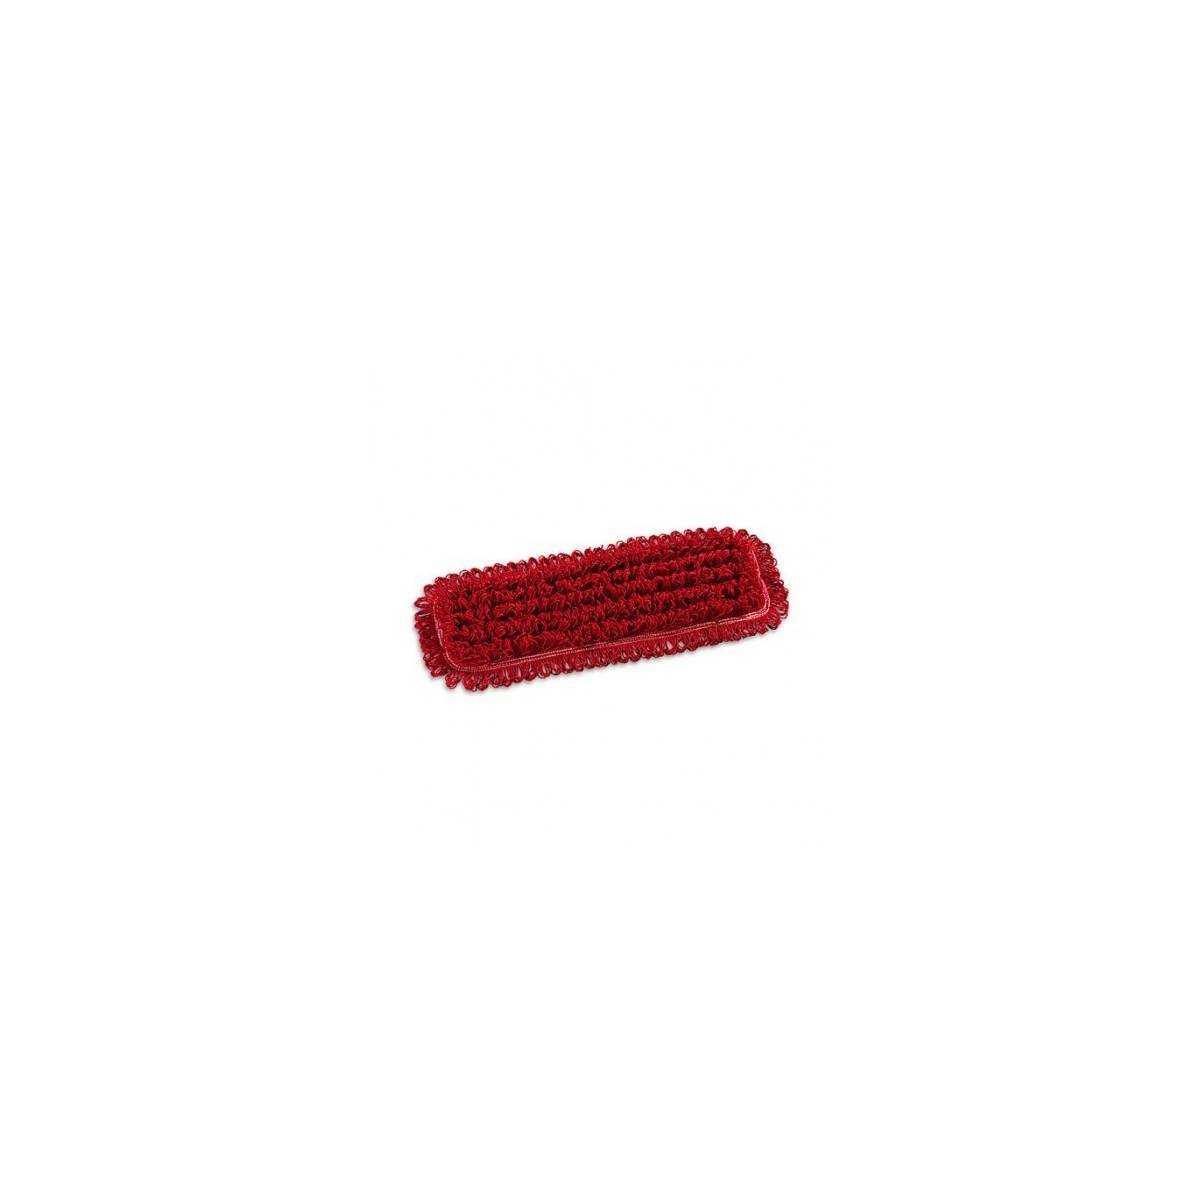 Моп Microriccio Blik микрофибра с карманами 40см (Цвет красный) 0R000476MR TTS